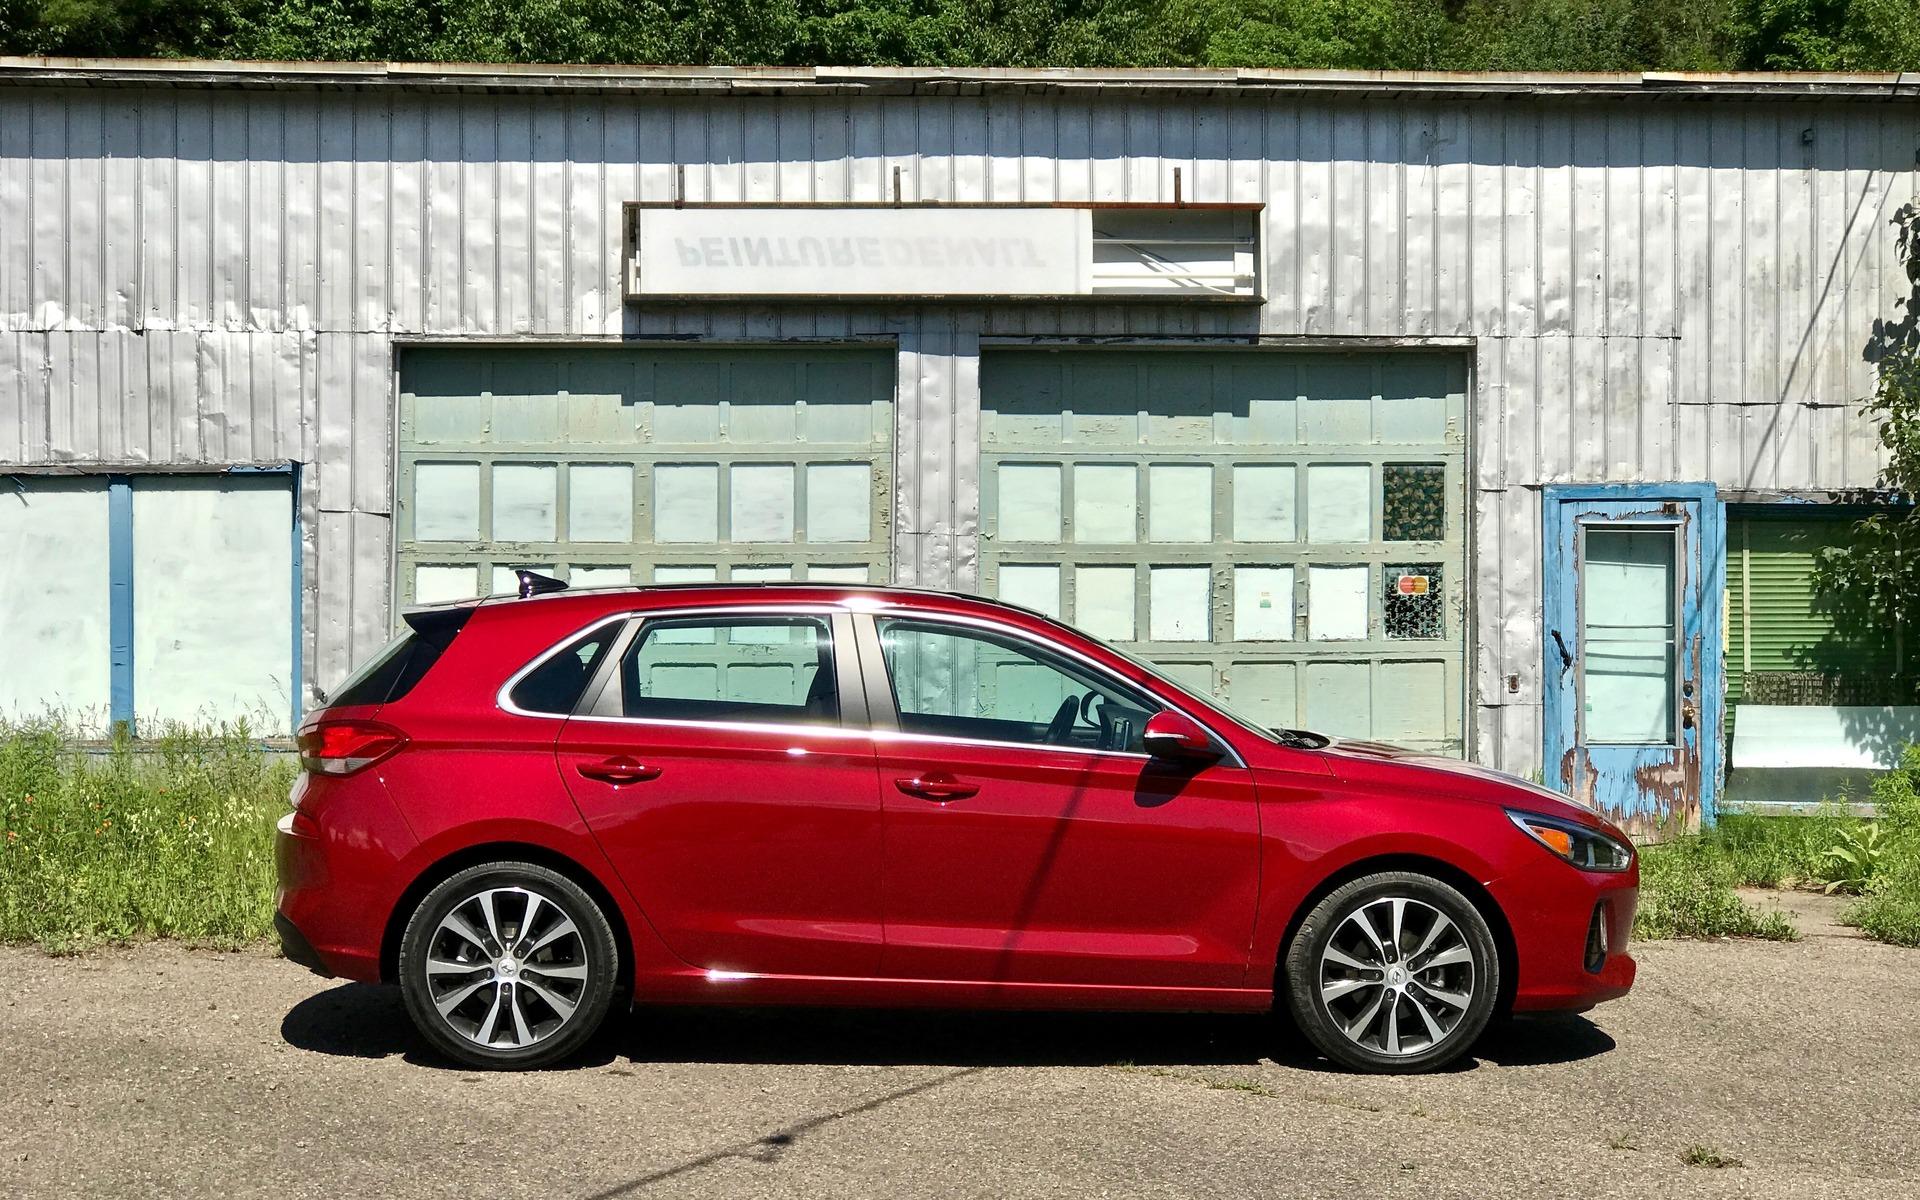 2018 Hyundai Elantra Gt Slightly Below Expectations The Car Guide